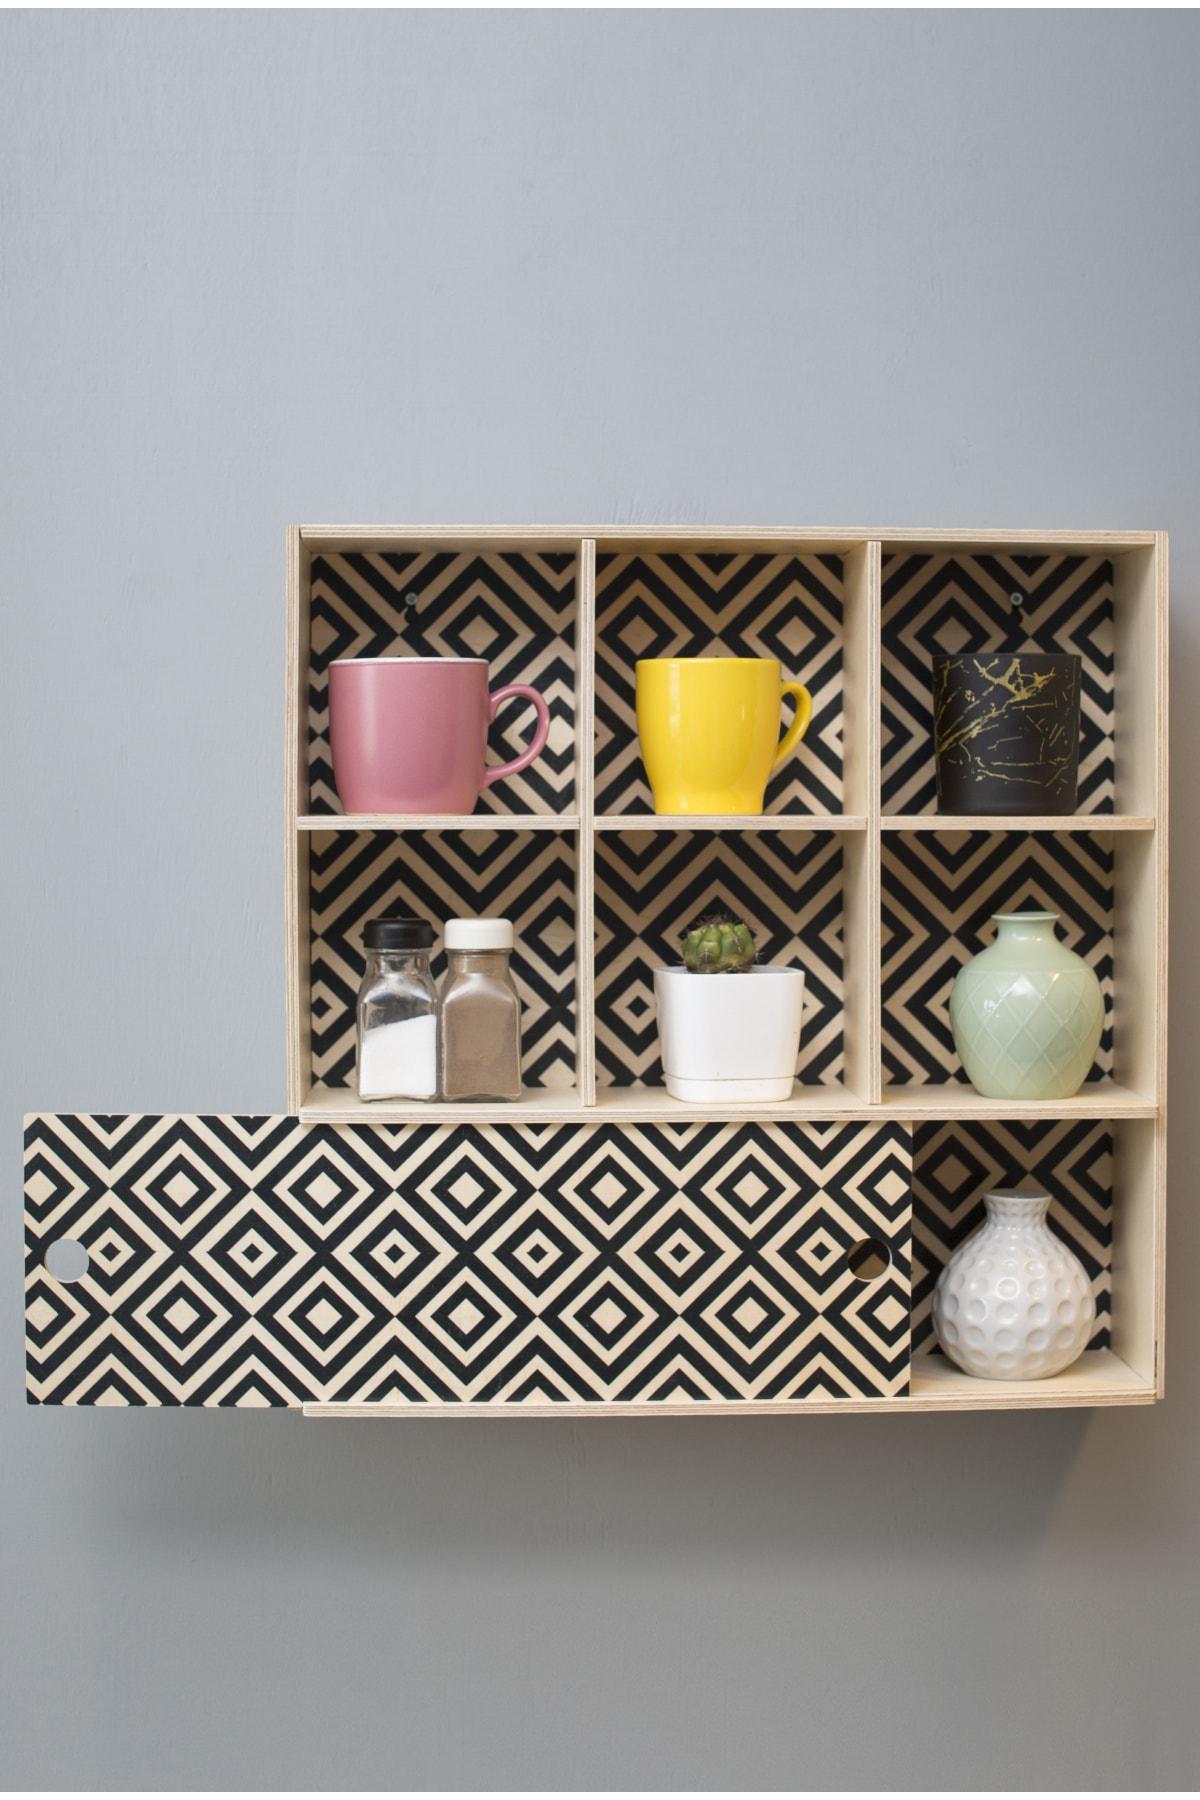 خشب أسود رف جدار X نموذج Plaıd رف مطبخ صندوق تخزين رف حمام غرفة الطفل رف